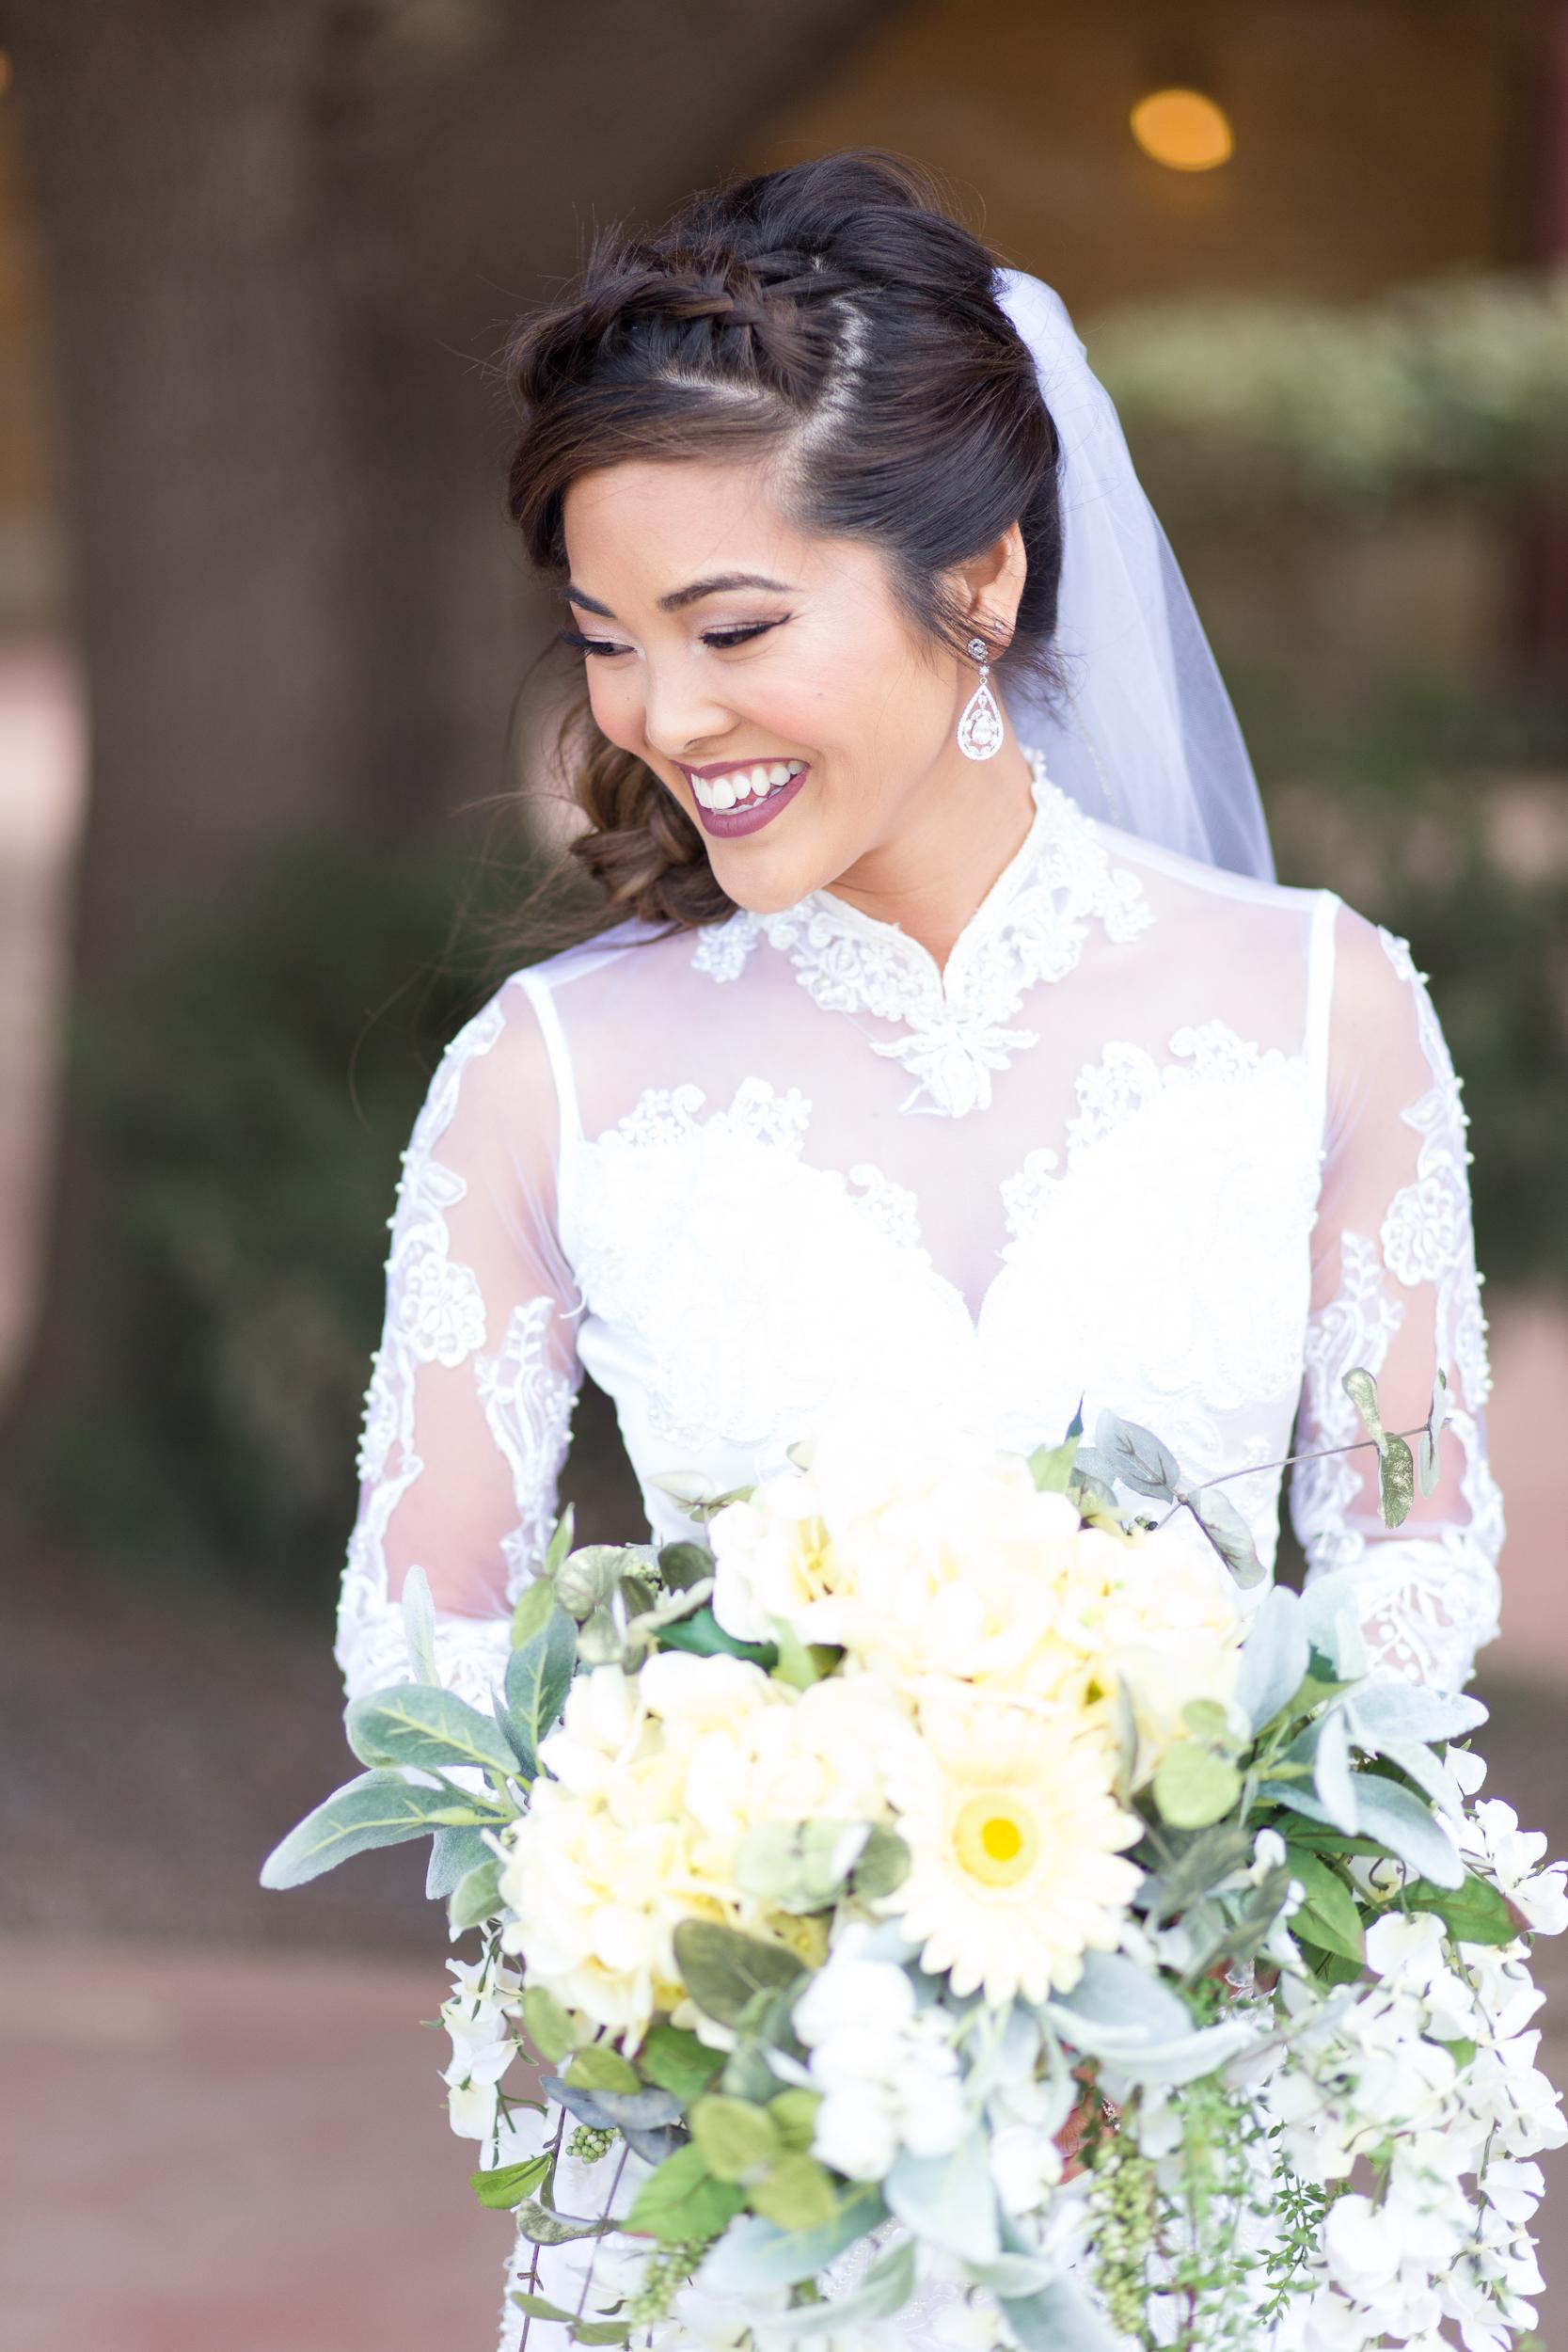 hall_wedding blog_kelsie hendricks photography_odessa_ west texas-52.jpg